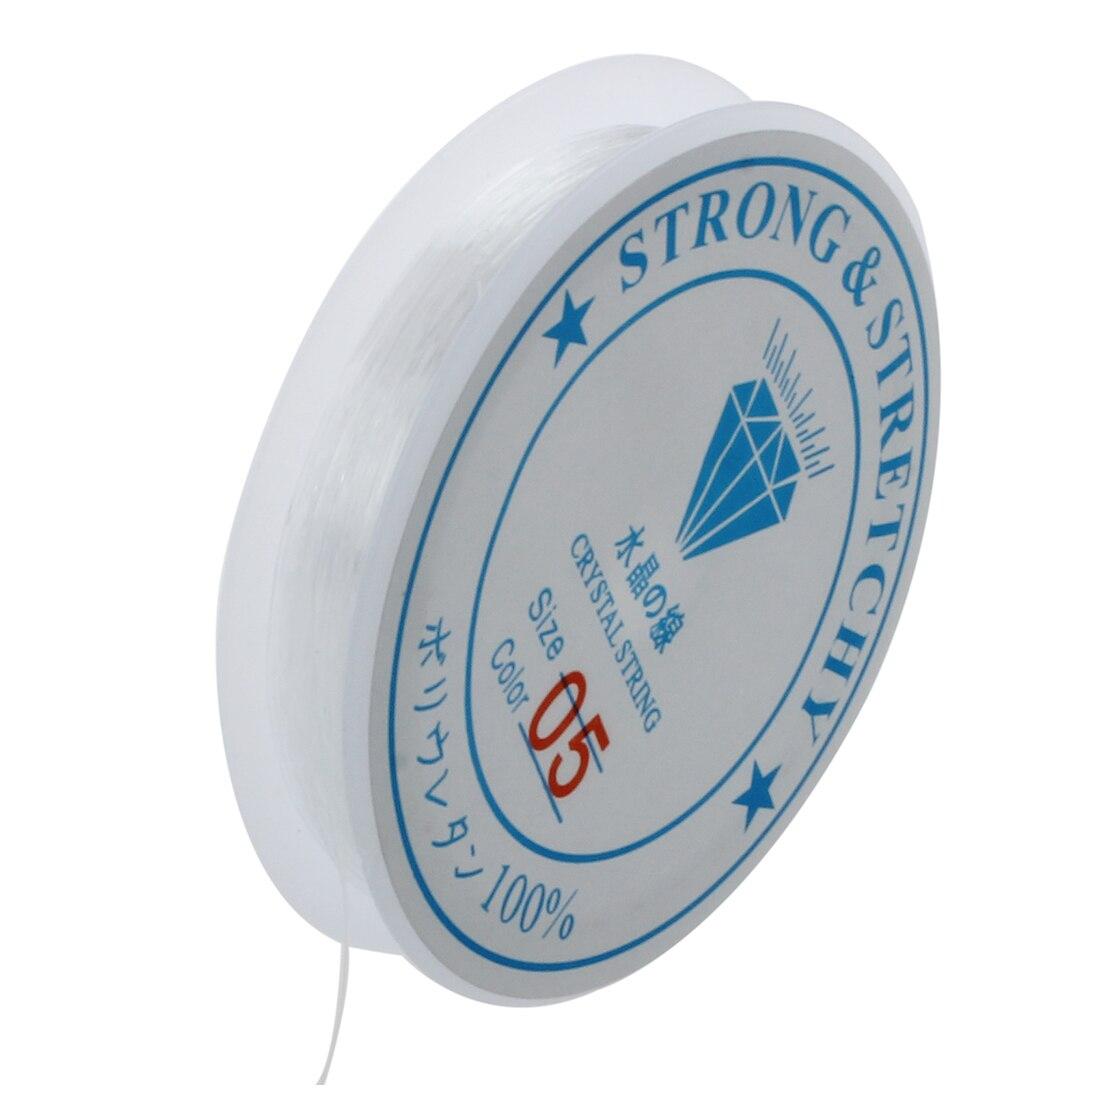 Ролл провод катушки прозрачный эластичный шнур 0.5 мм